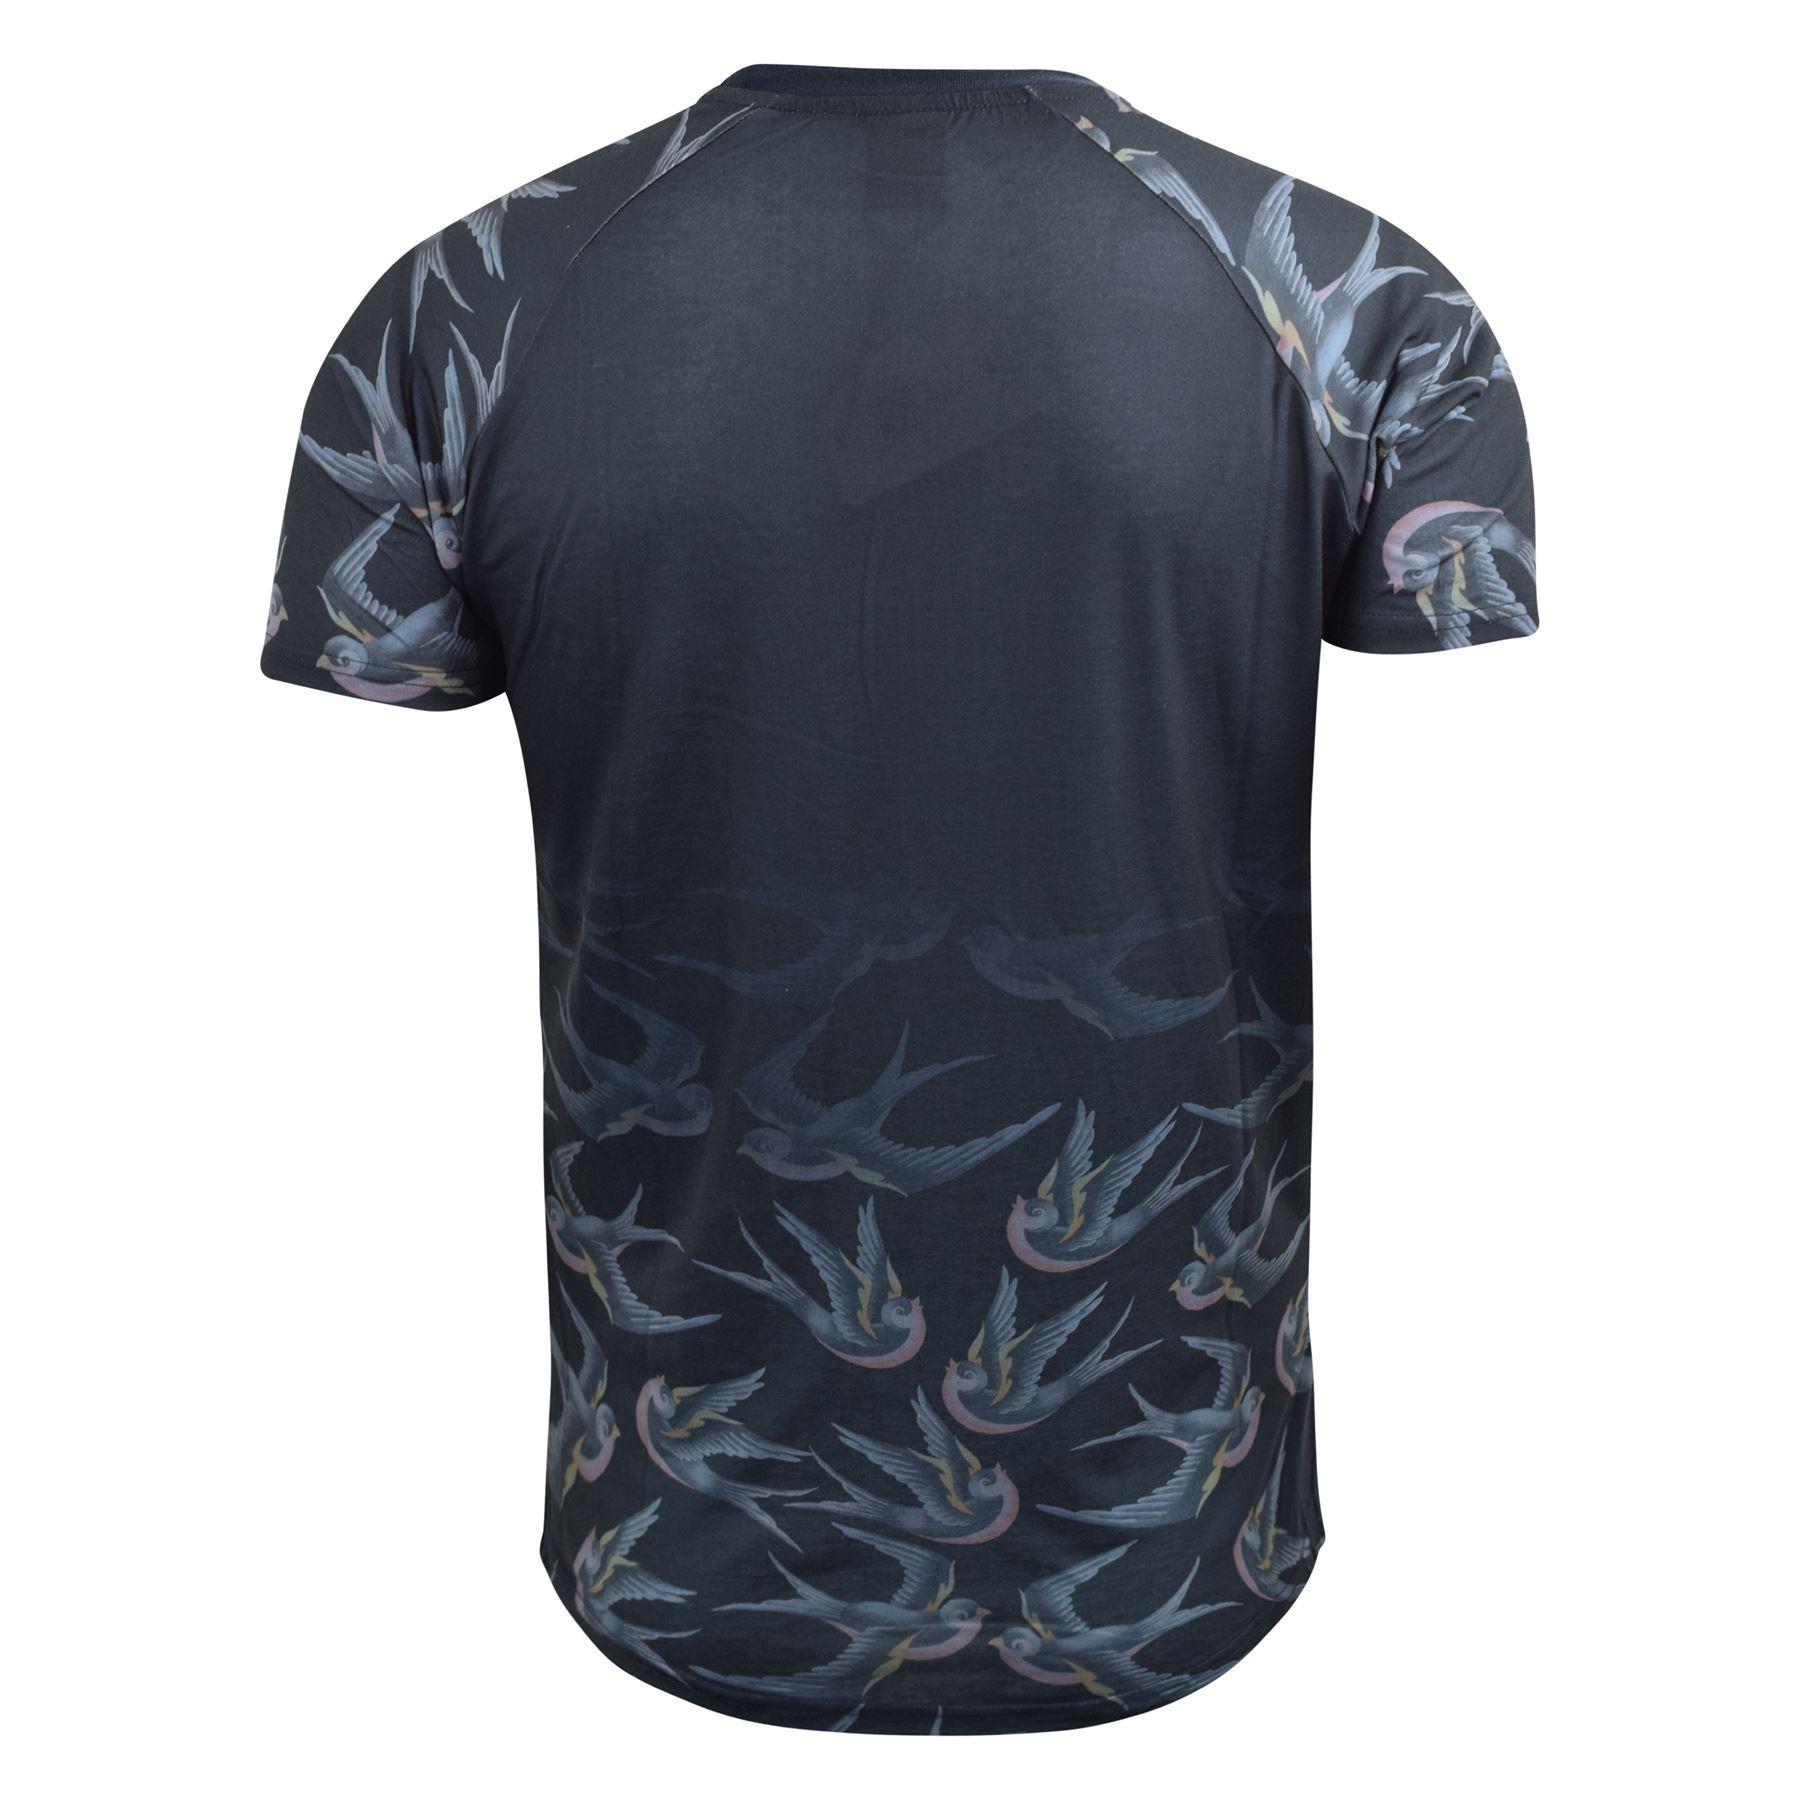 Mens-T-Shirt-Crosshatch-Short-Sleeved-Raglan-Print-Tee-Top-Averys thumbnail 3